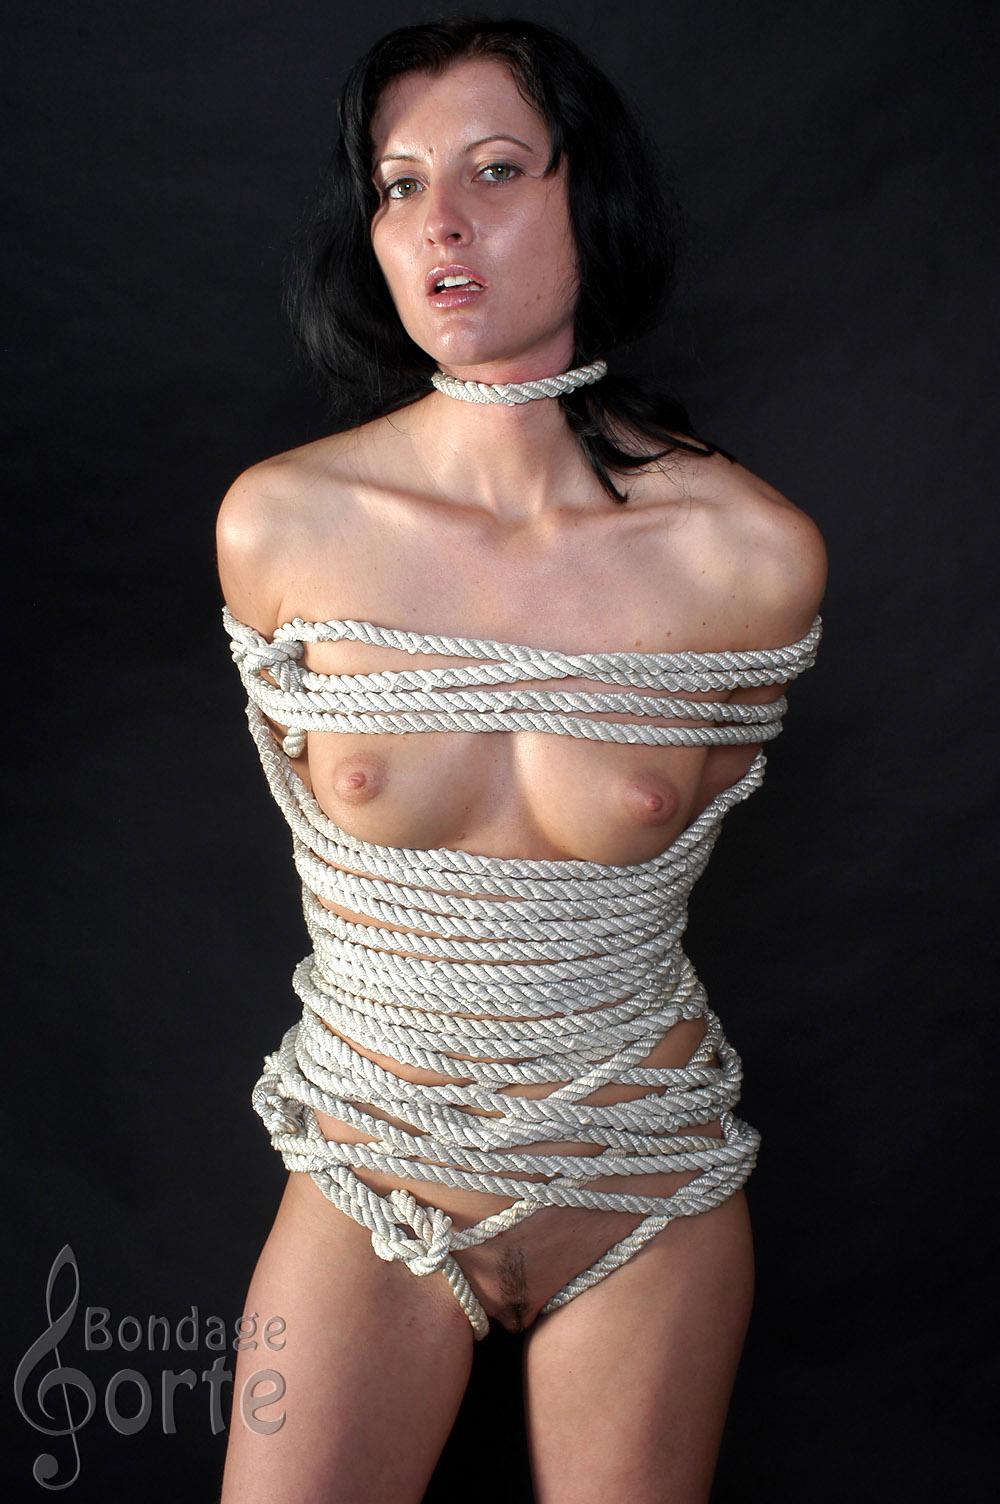 Forte porn bondage Bondage